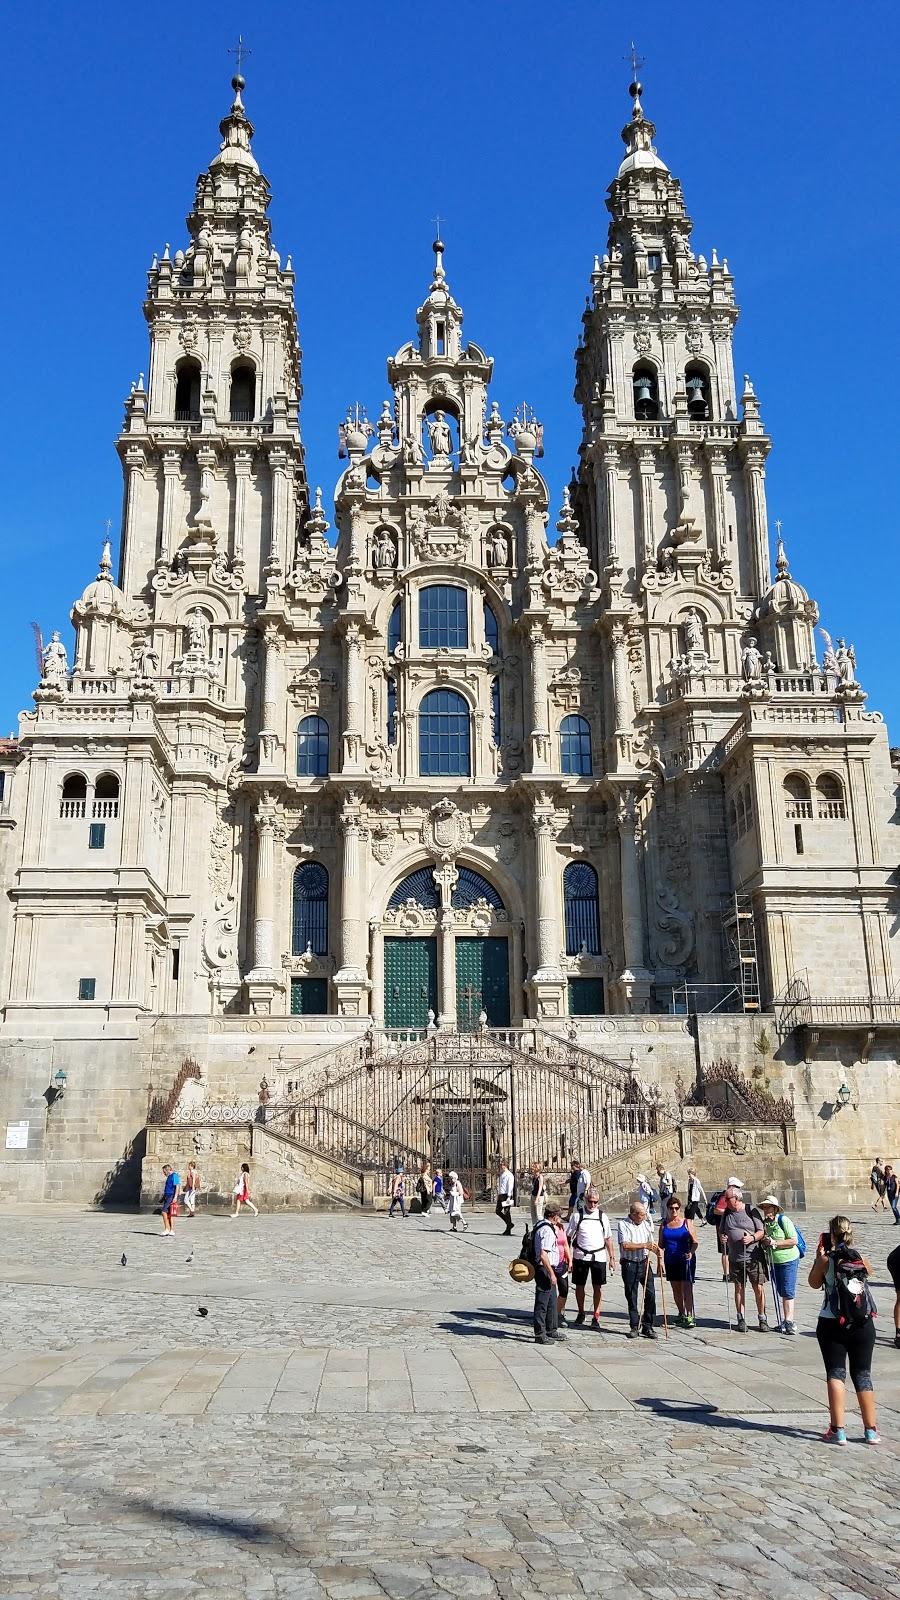 The Cathedral of Santiago de Compostela where the bones of the Apostle Saint James lie interred beneath the altar.